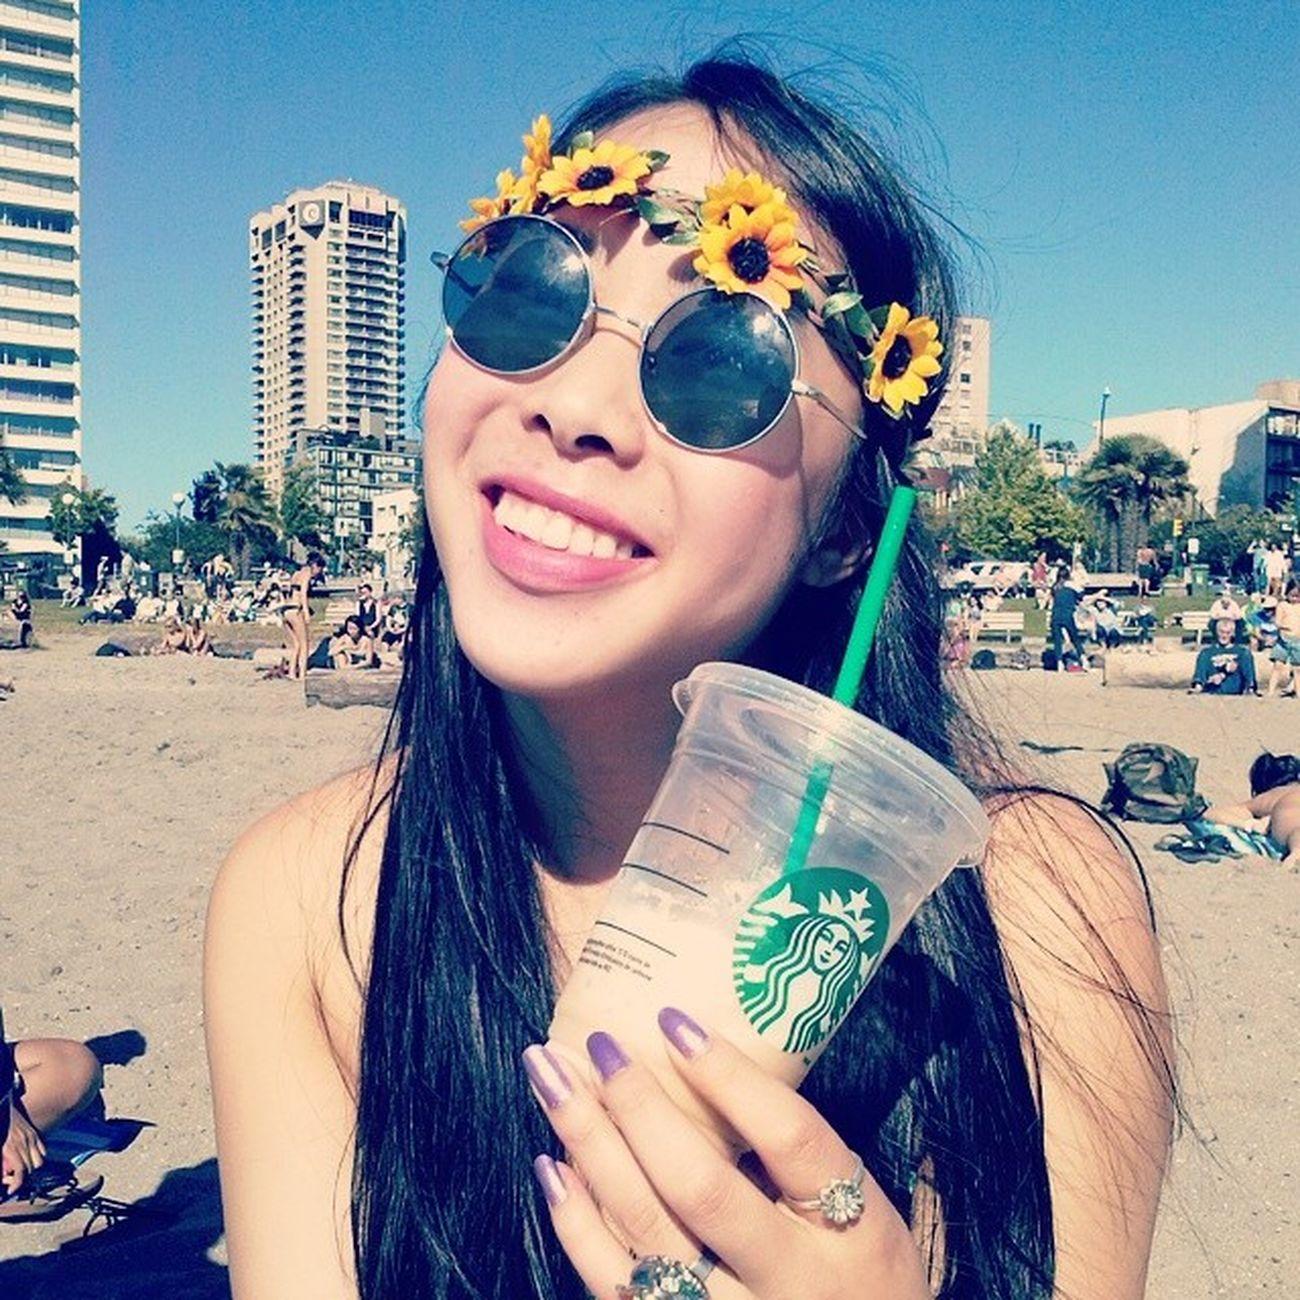 Starbucks Butterbeer Frap Beach summer englishbay flowercrown hipster